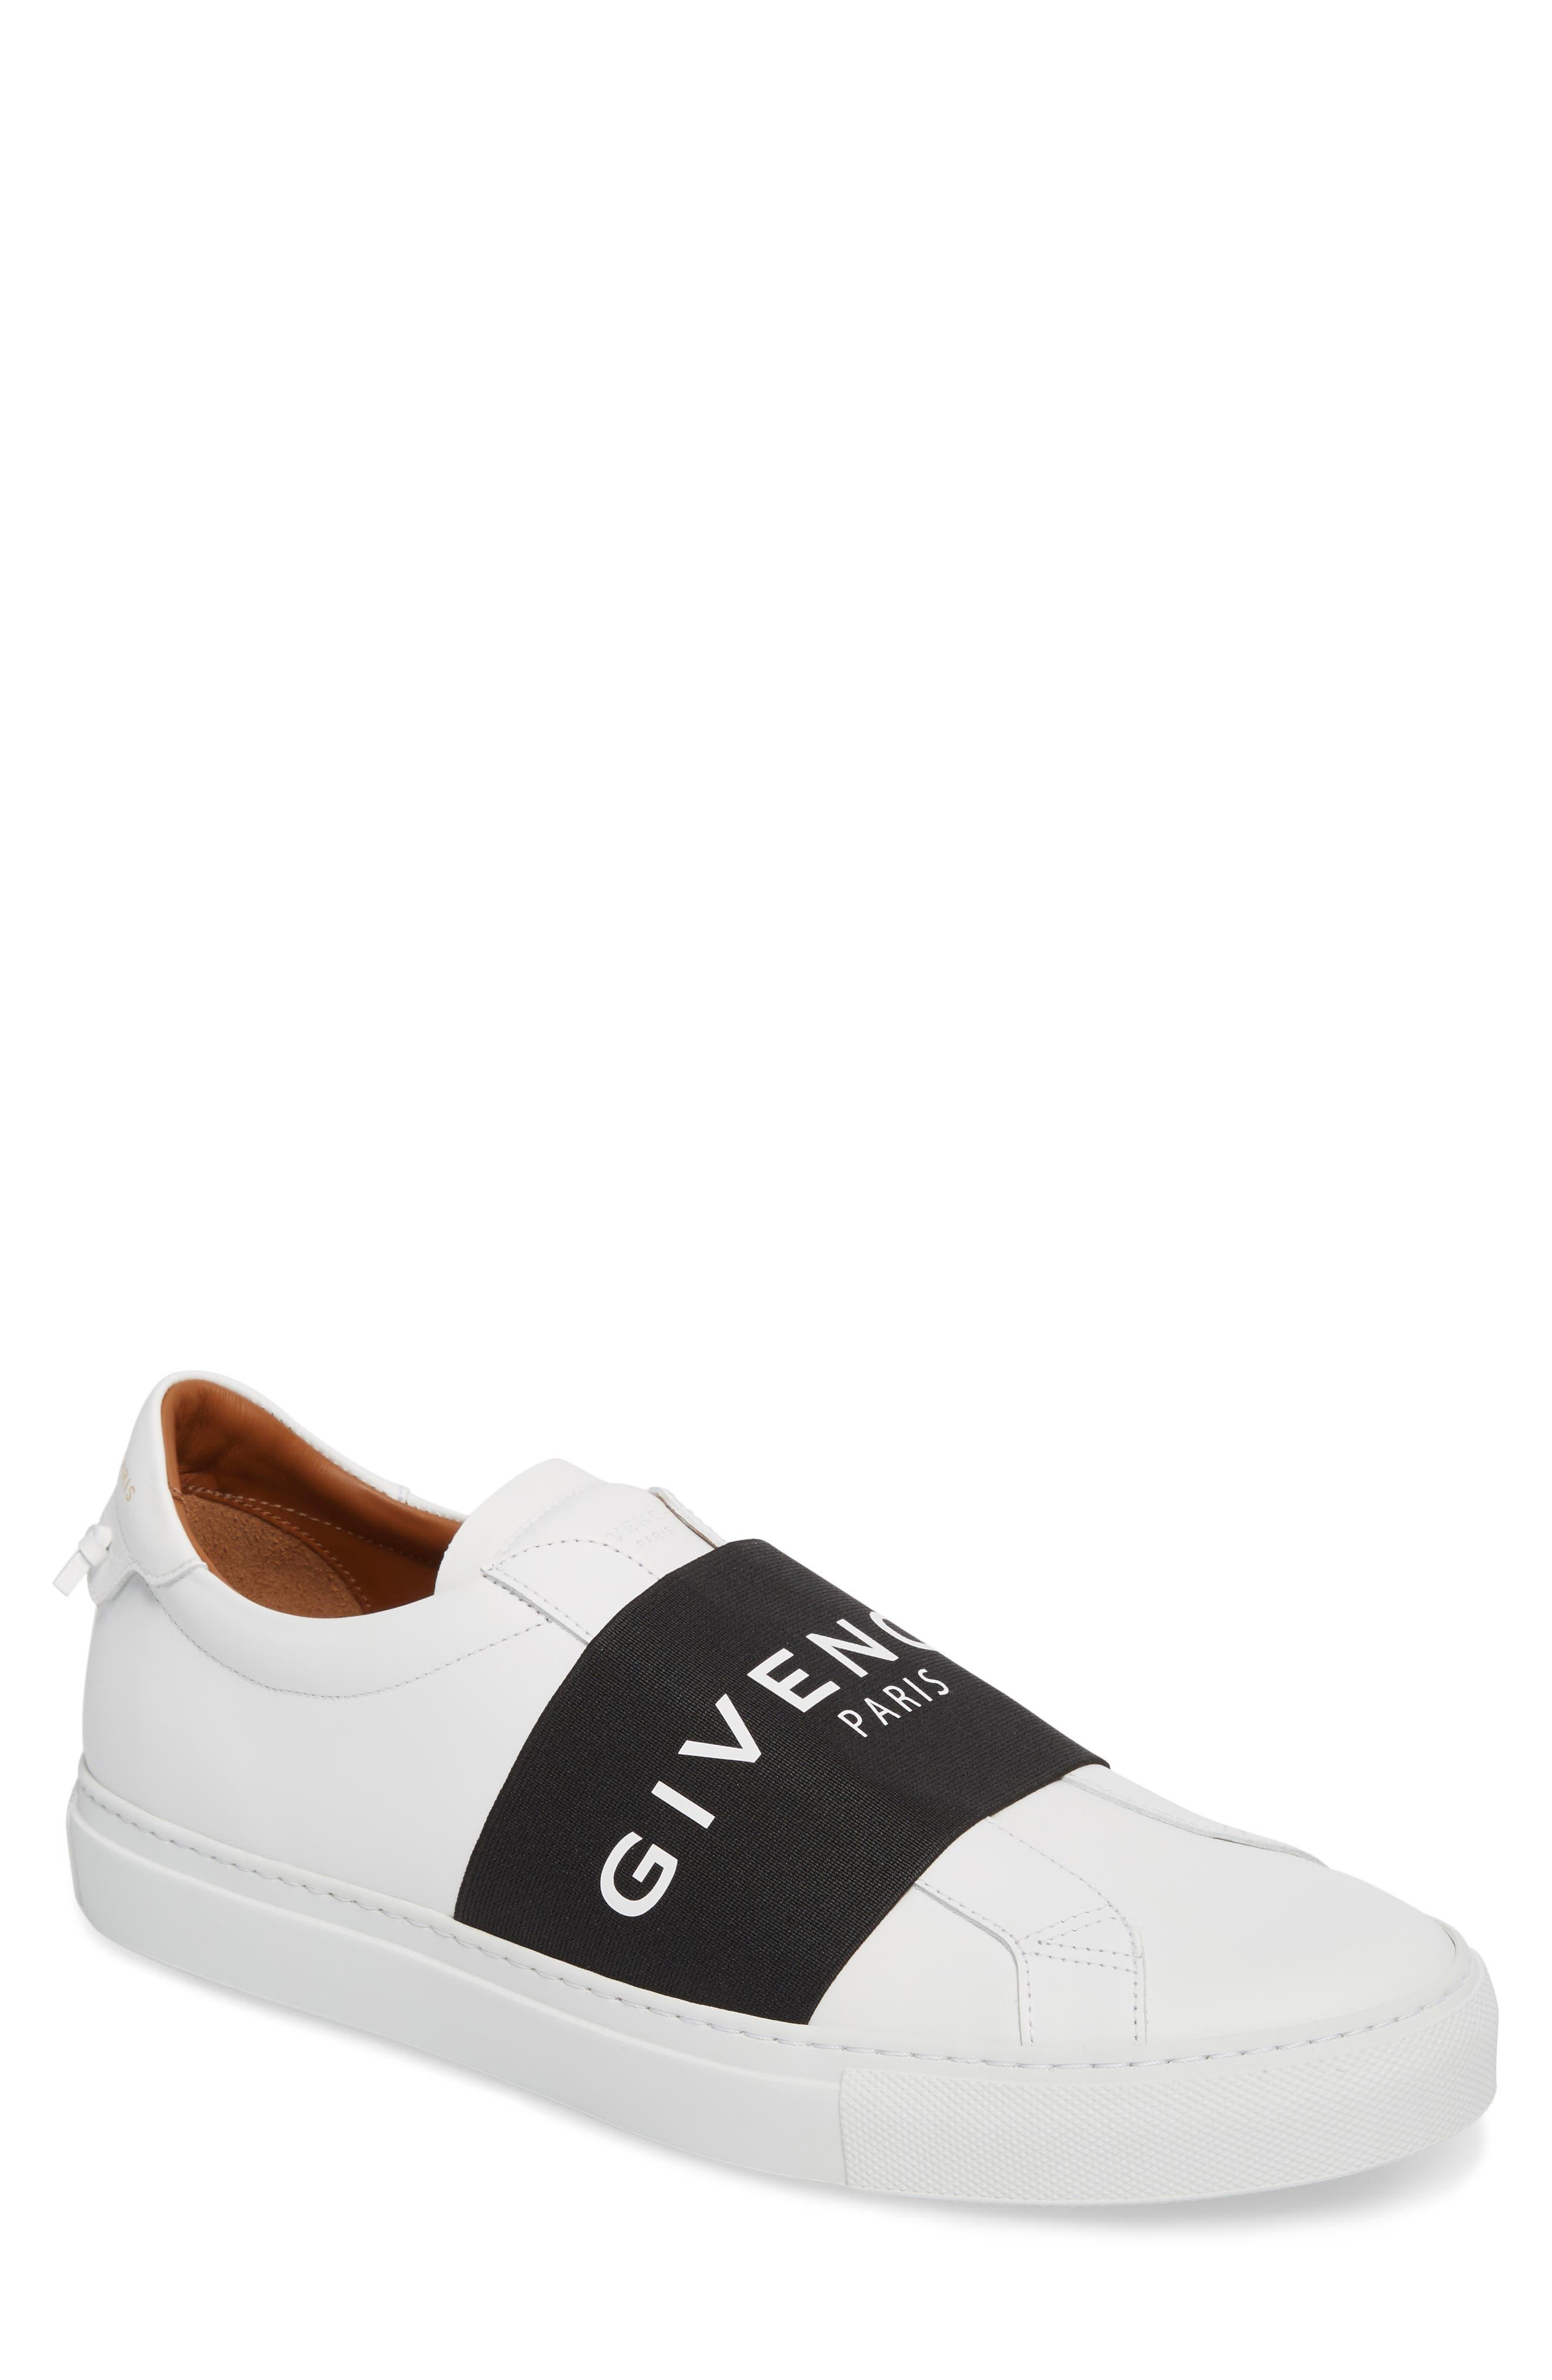 Givenchy Urban Knots Sneaker (Men)